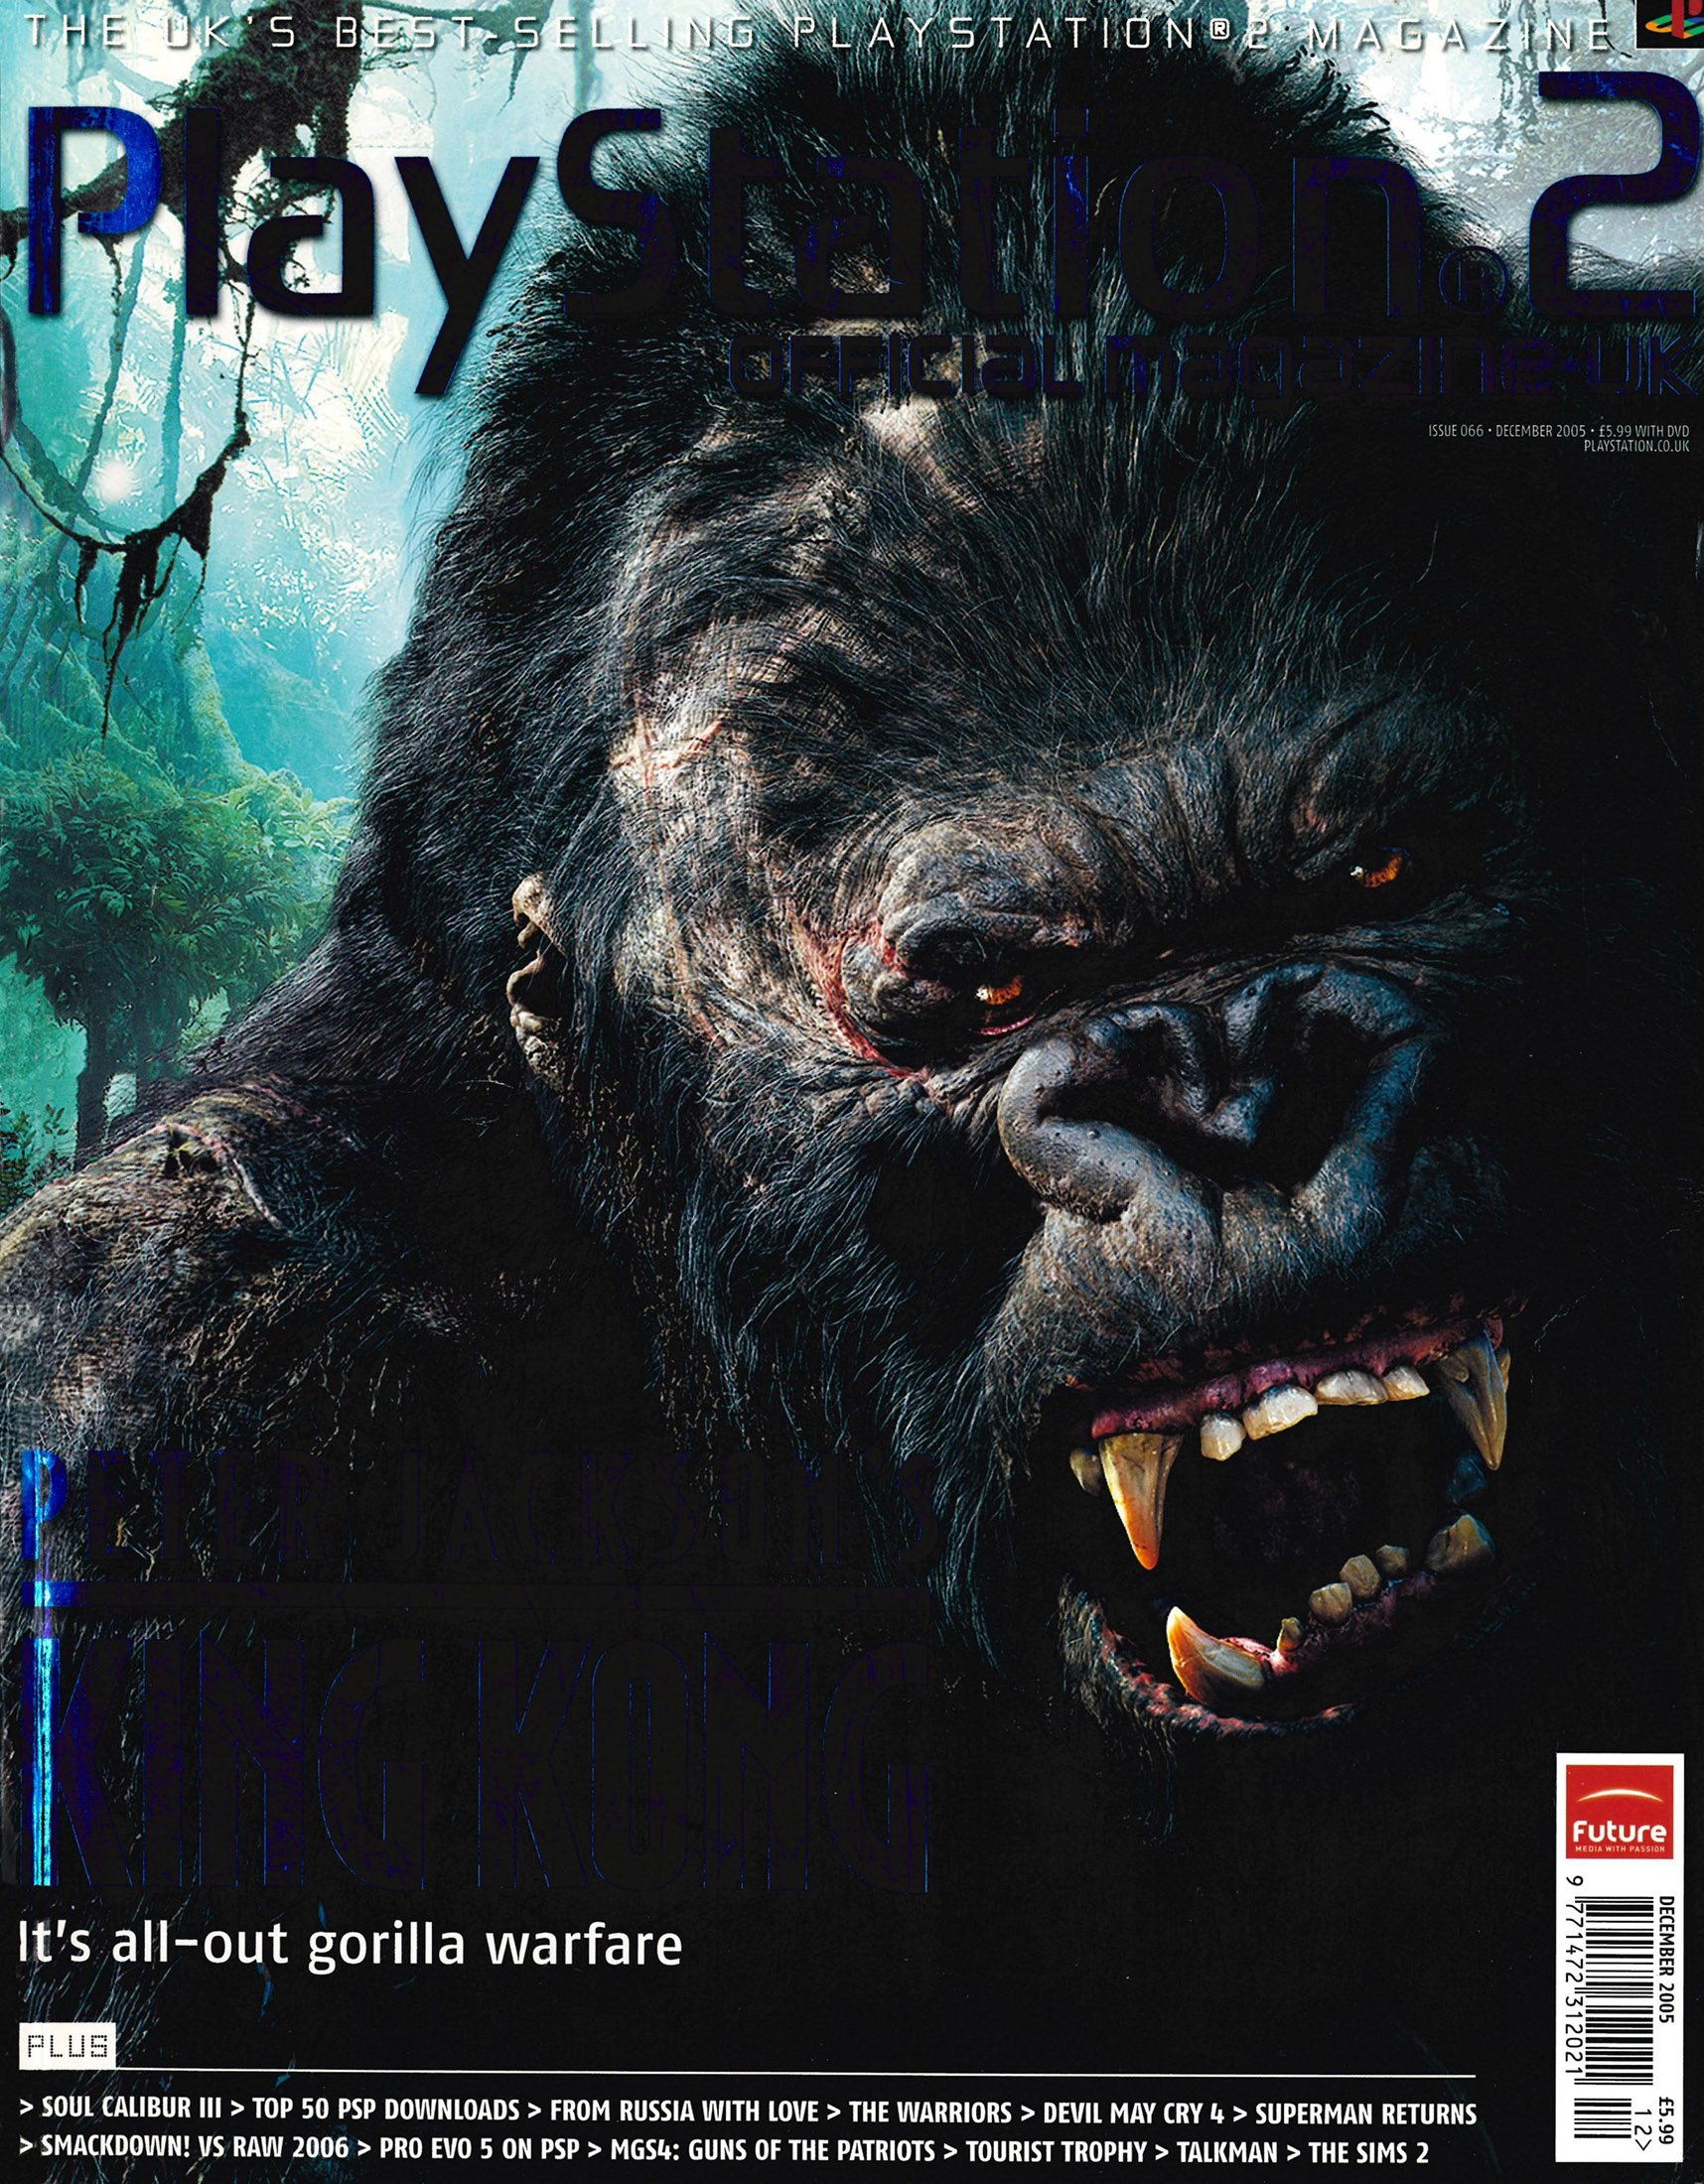 Official Playstation 2 Magazine UK 066 (December 2005)